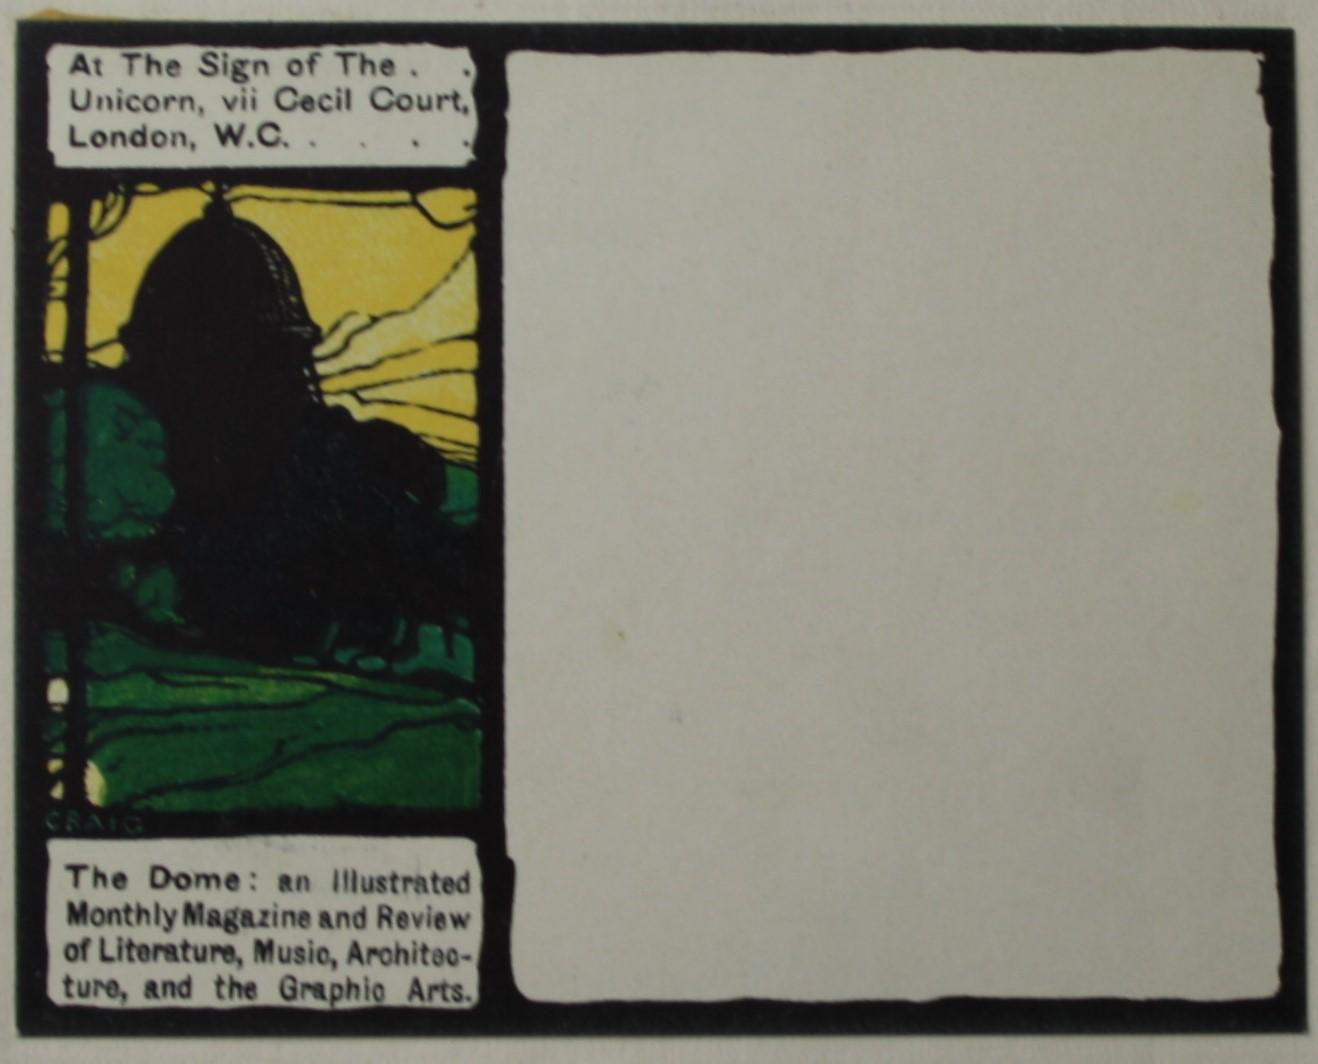 The Dome Postcard